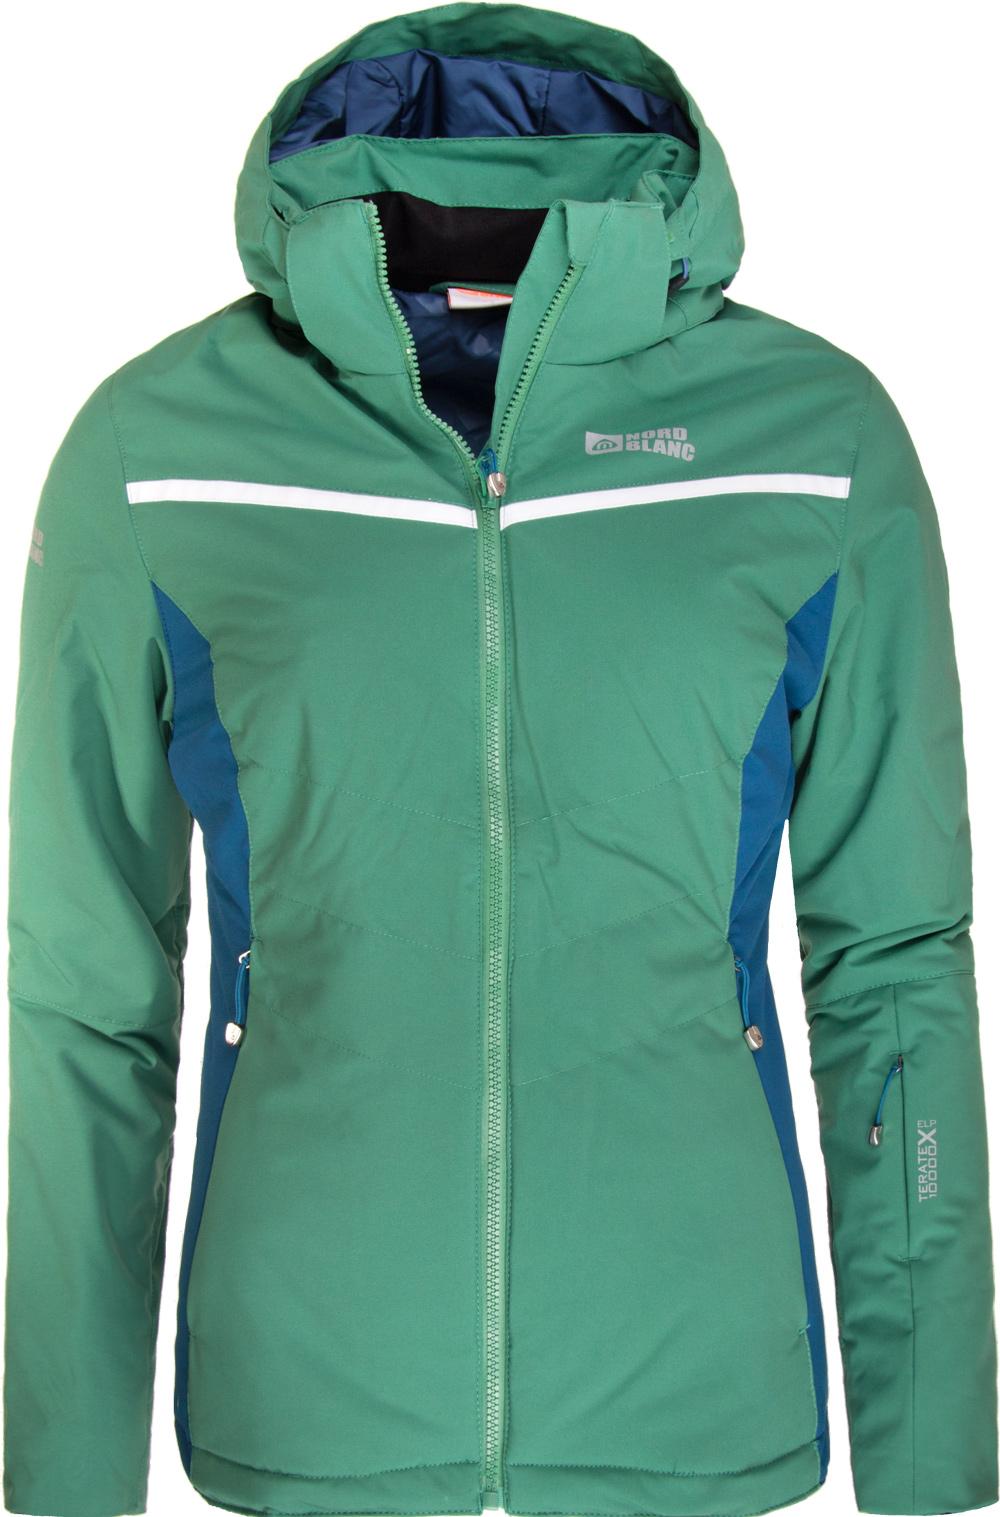 Lyžařská bunda dámska NORDBLANC Petite - NBWJL6419